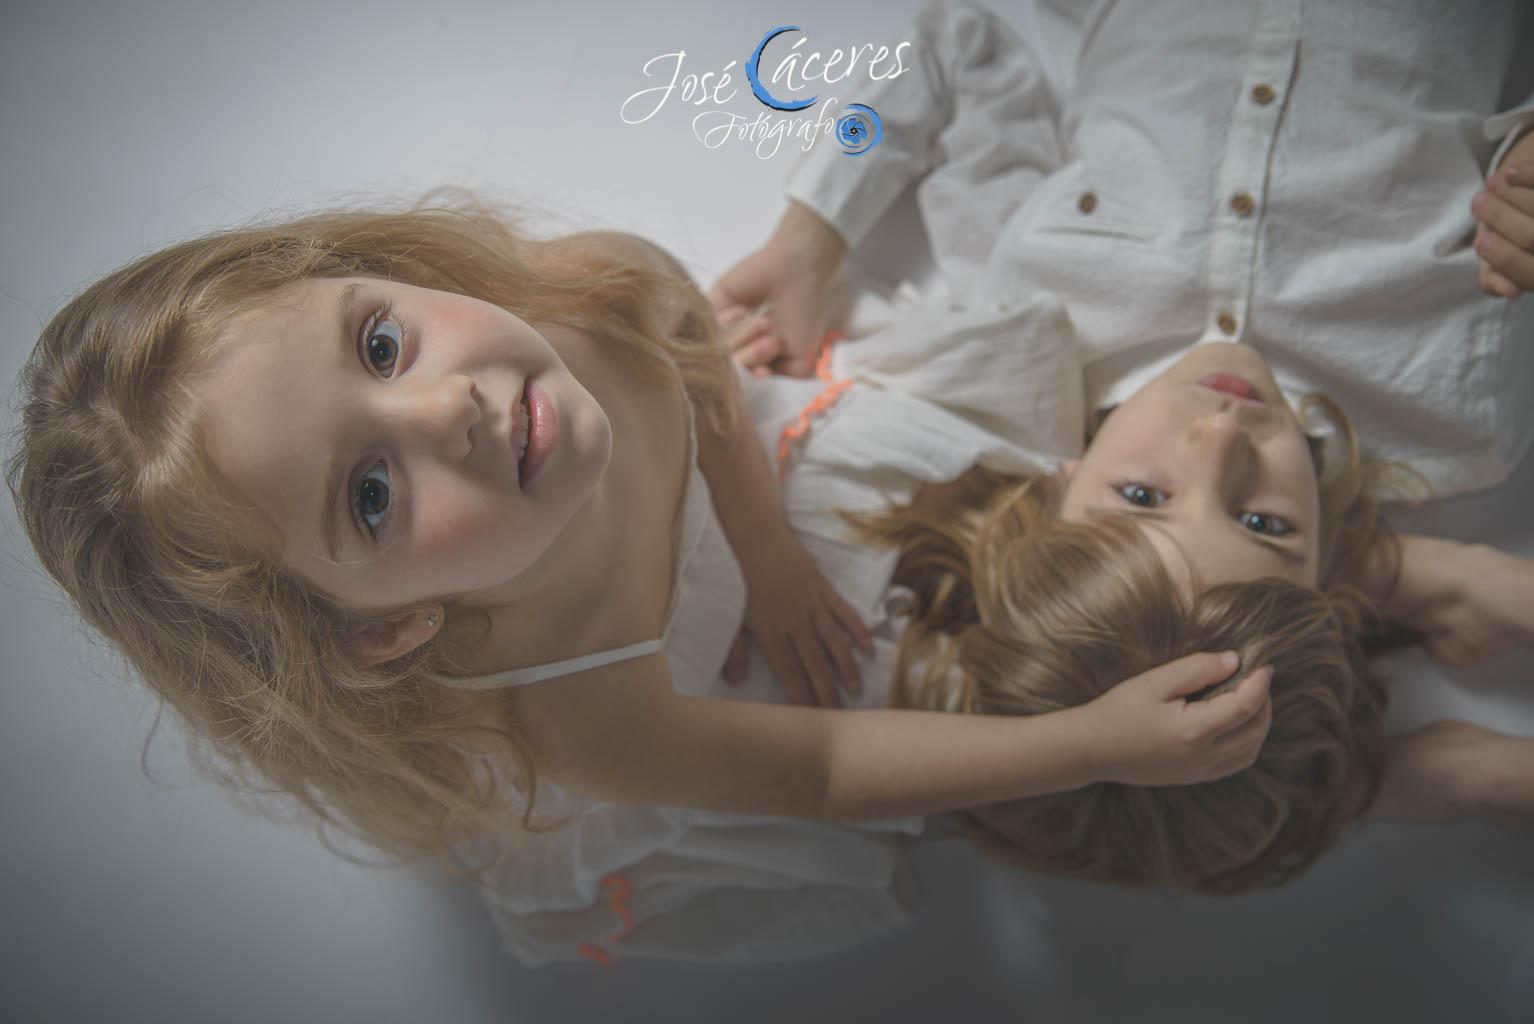 Jose Caceres Fotografia, Sesion Estudio Fotografia Niños-10